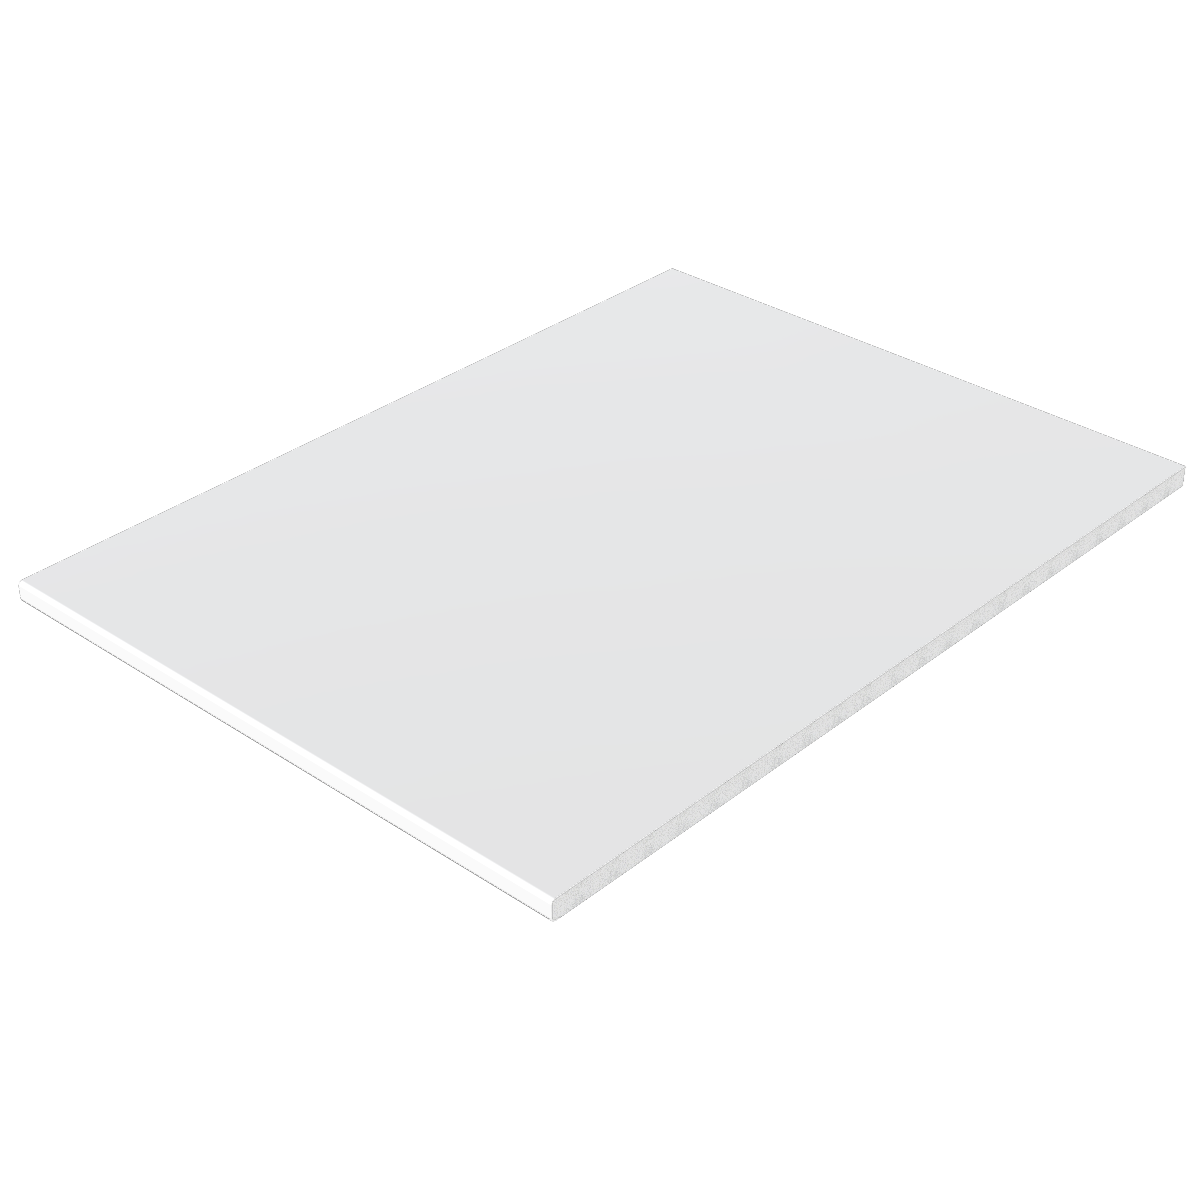 White Flat Board